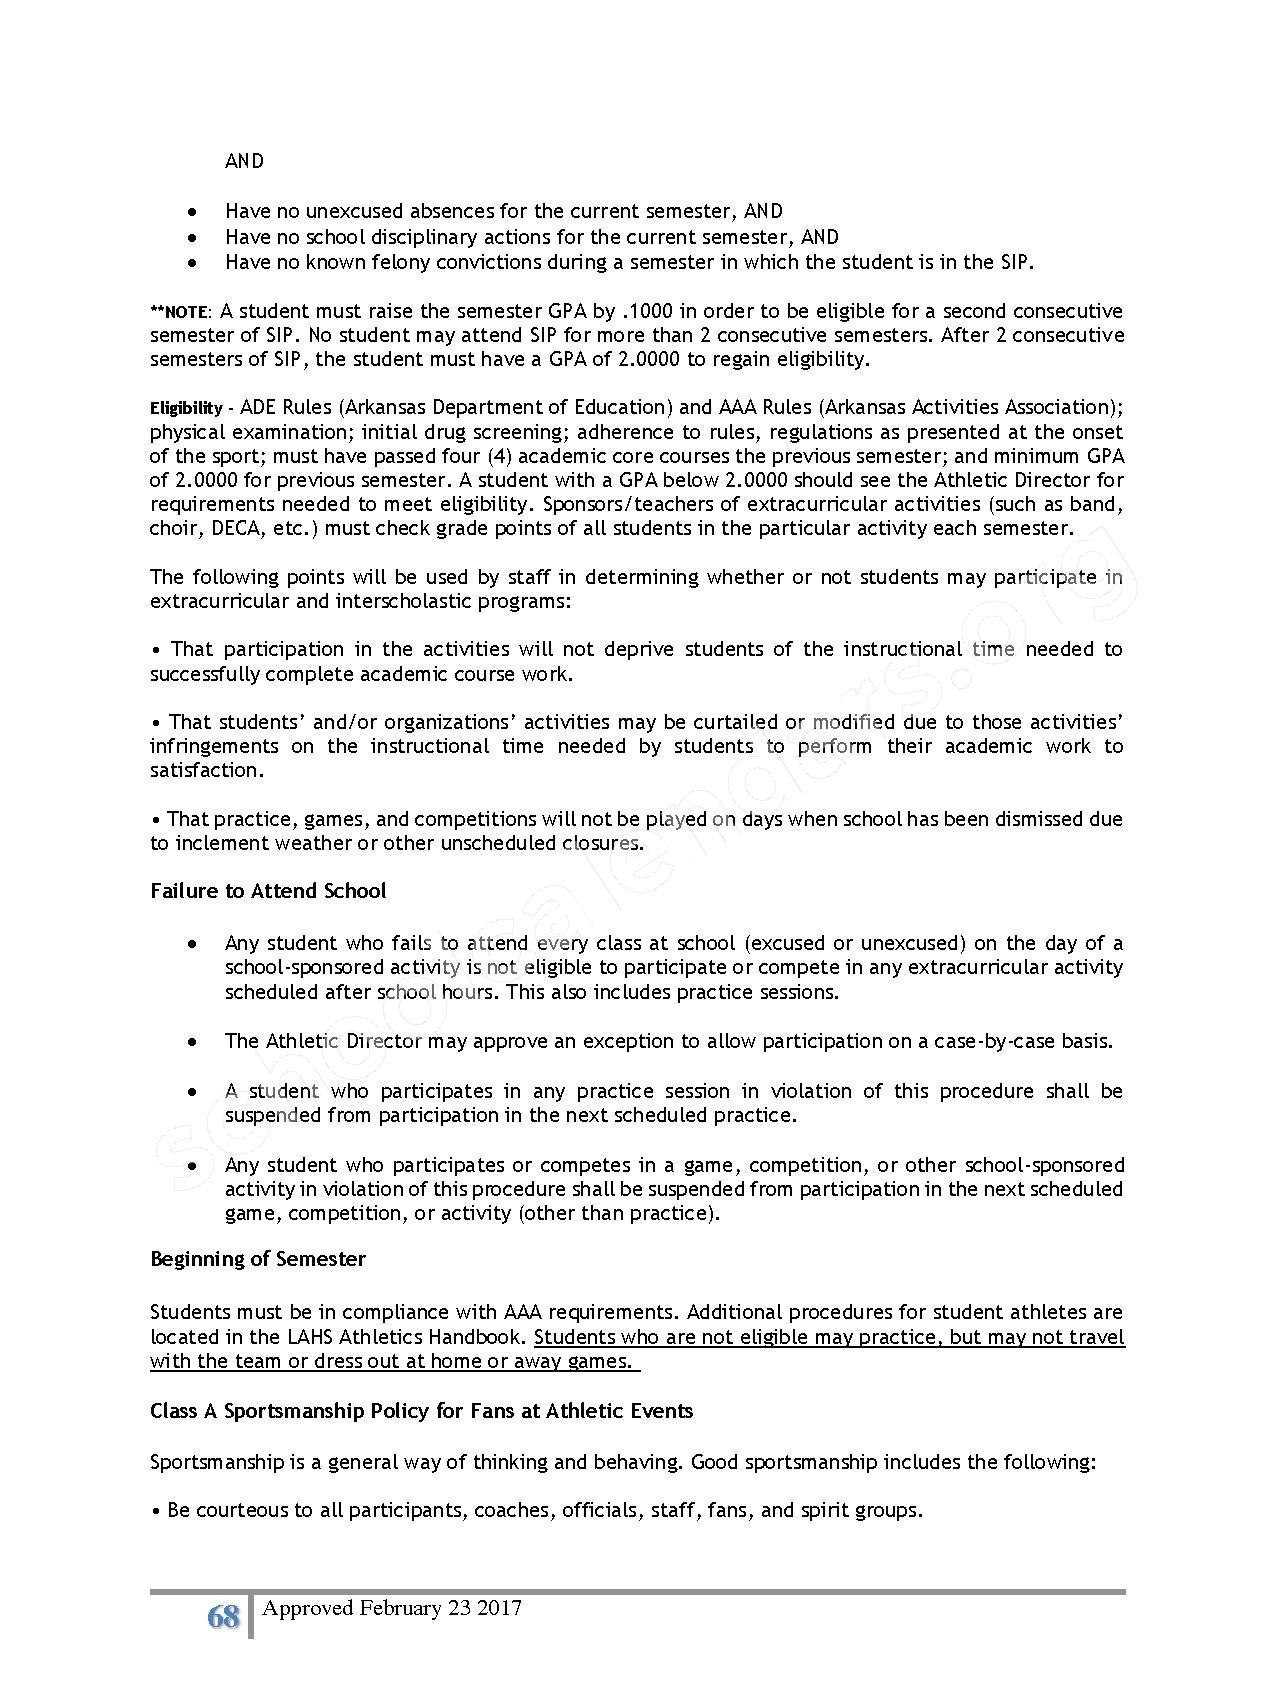 2016 - 2017 District Calendar – Lisa Academy Public Charter Schools – page 68